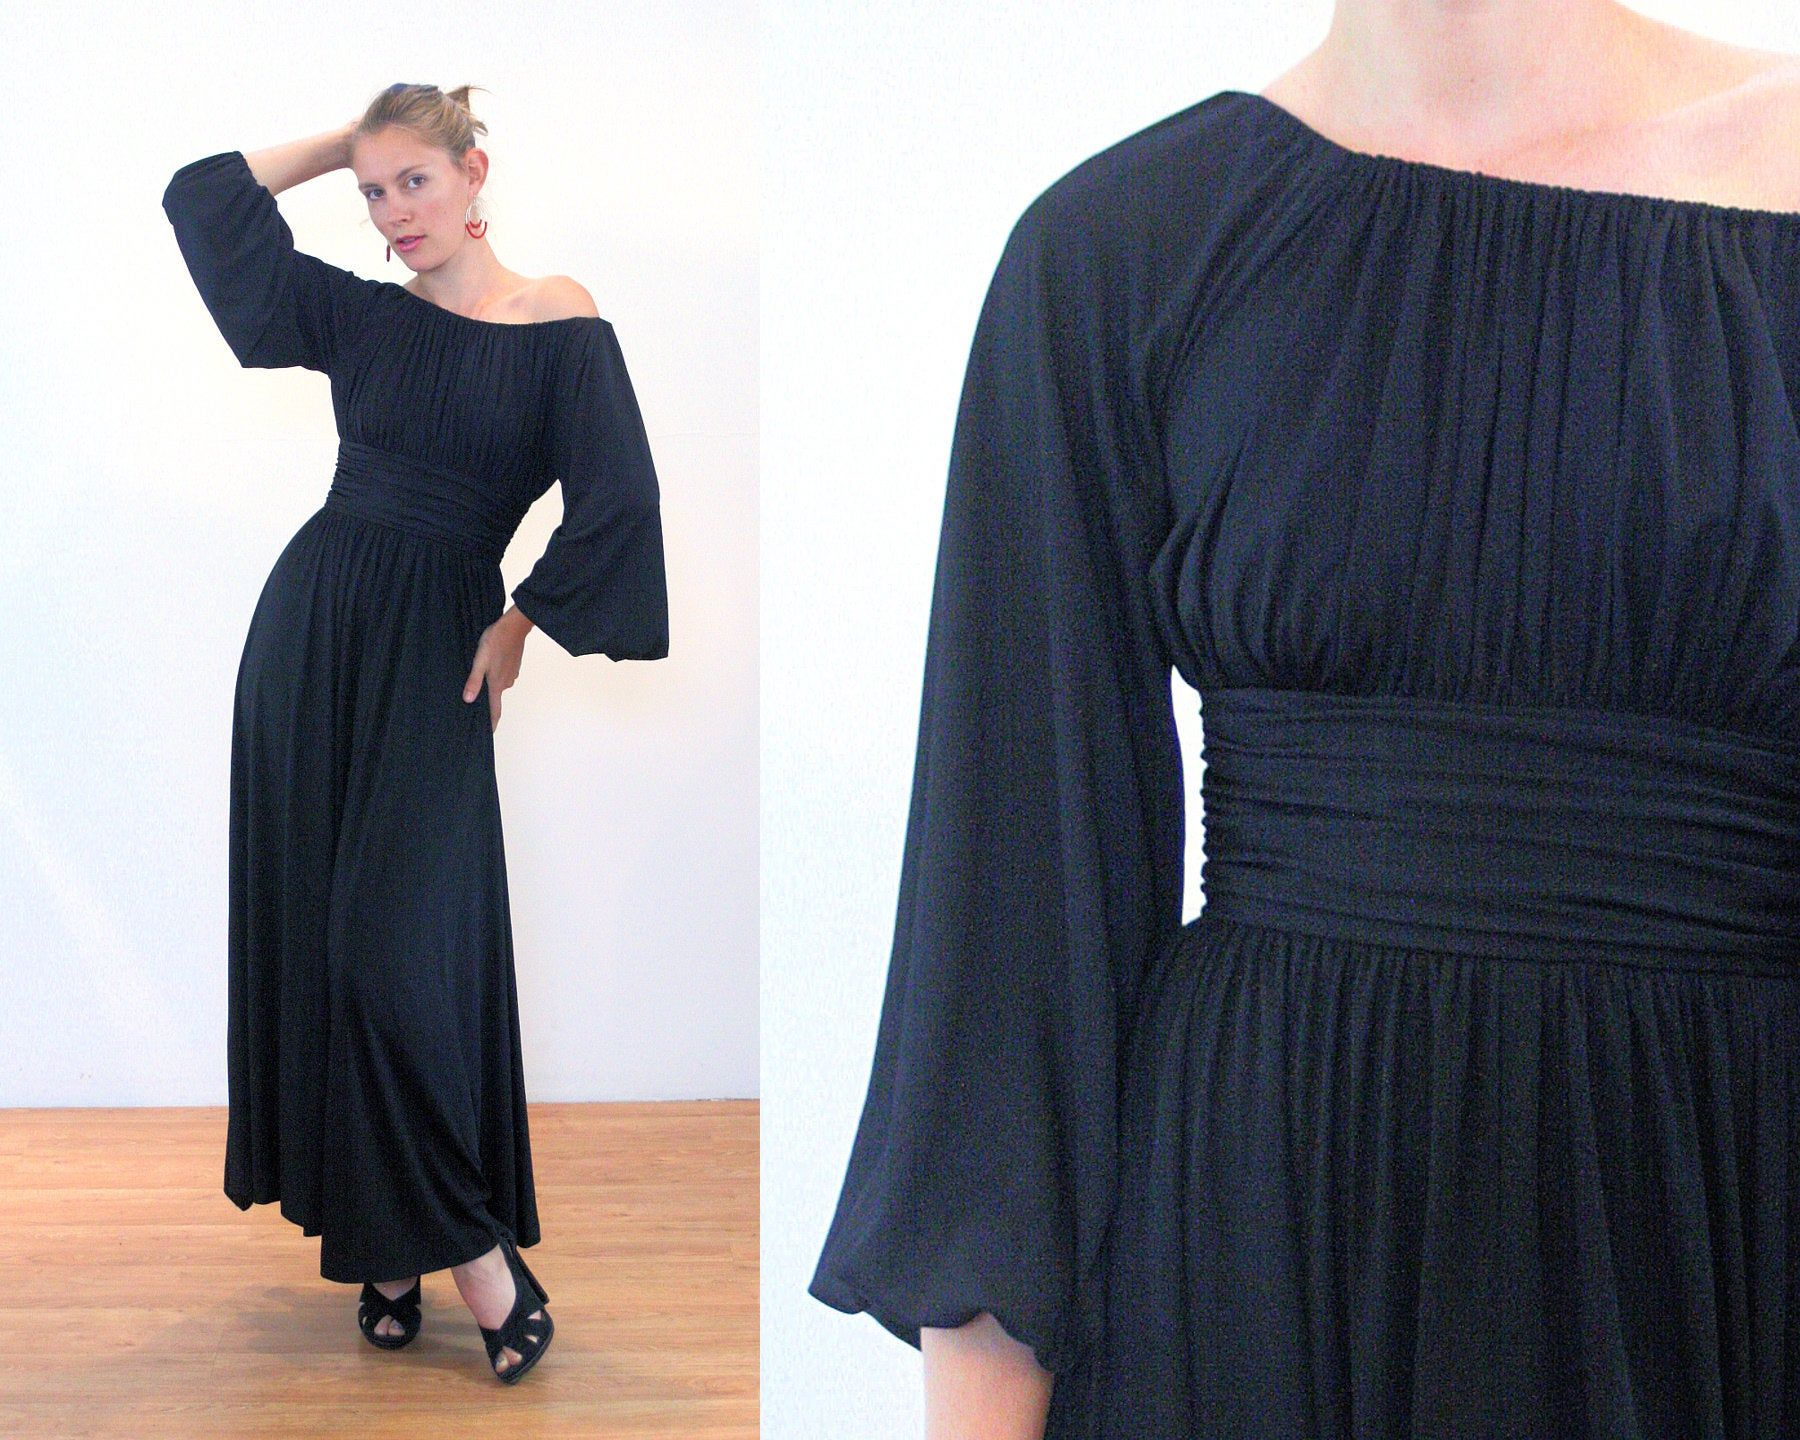 70s Black Maxi Dress M Vintage Ruched Black Off The Shoulder Etsy Black Maxi Dress Dresses Maxi Dress [ 1440 x 1800 Pixel ]